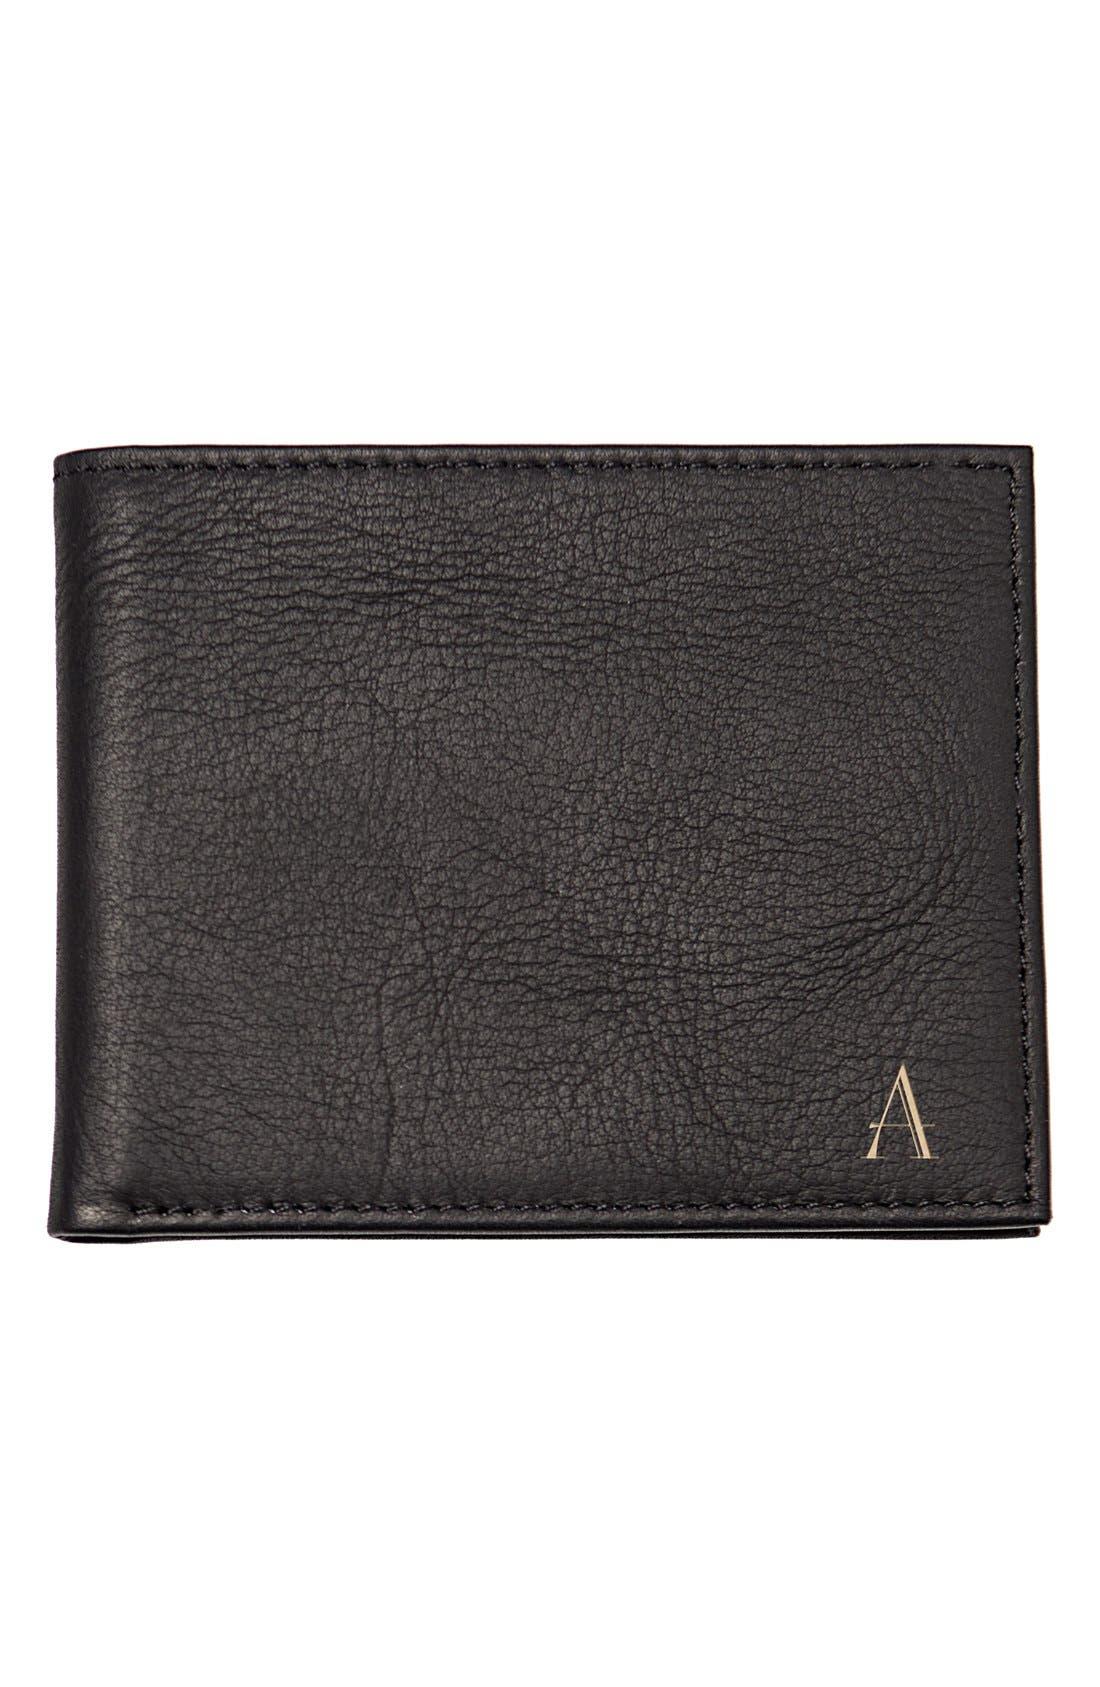 Monogram Bifold Wallet,                         Main,                         color, Black - A